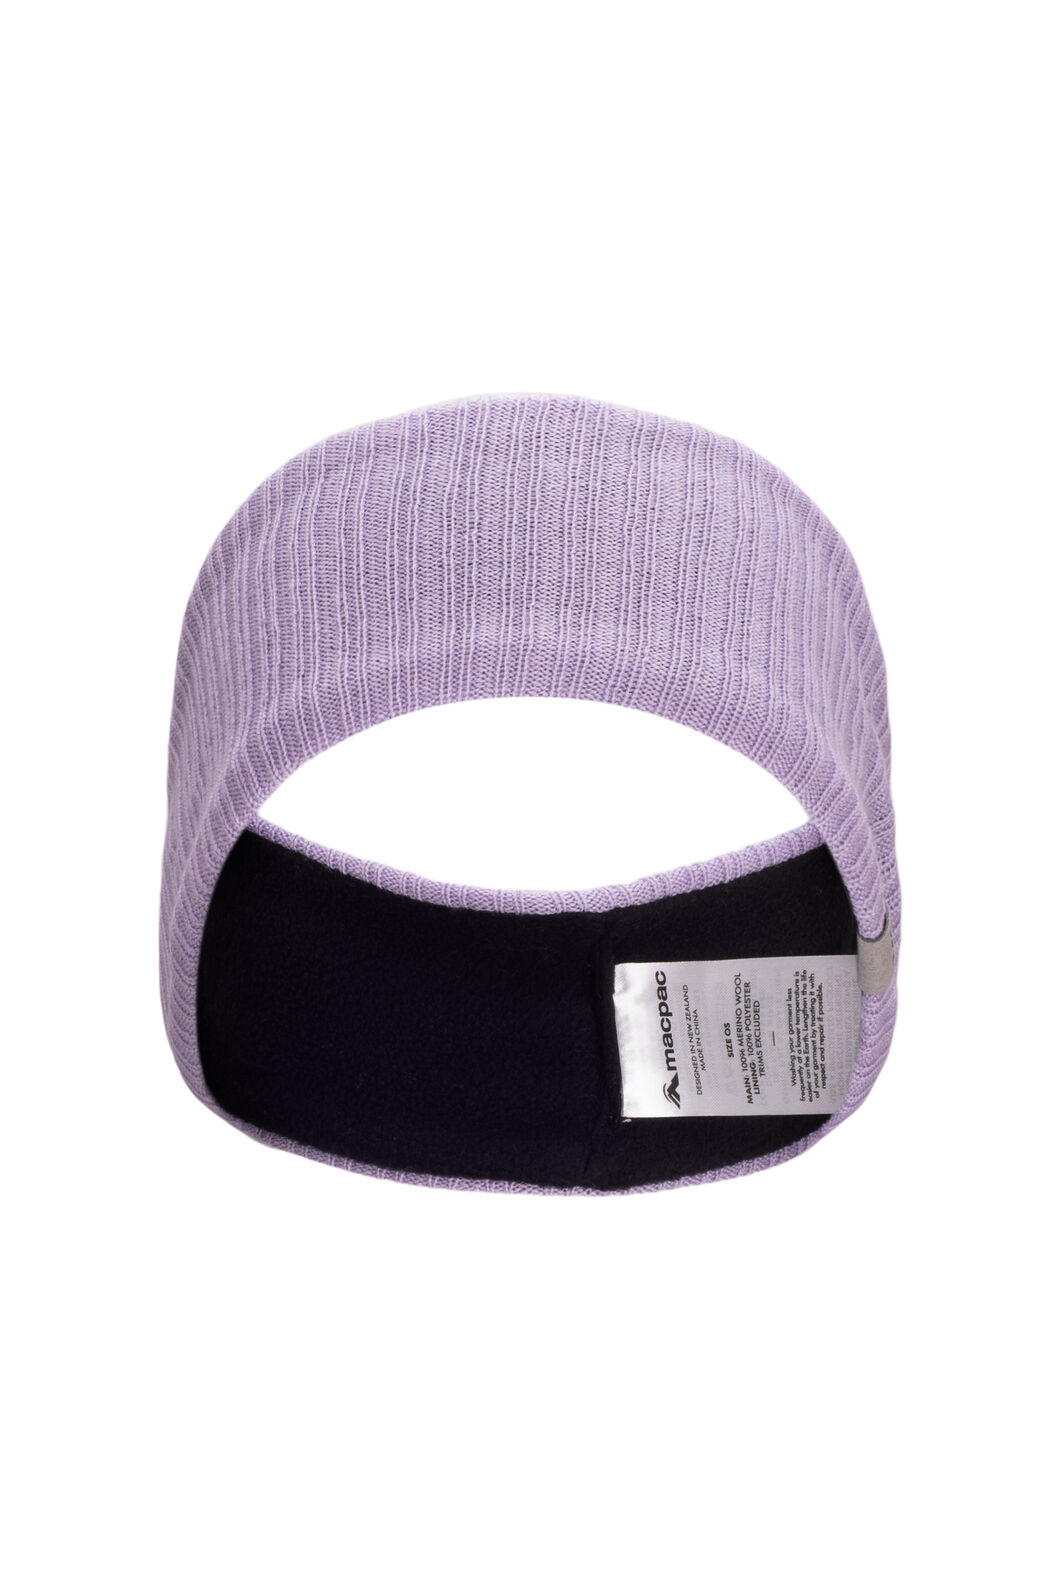 Macpac Merino Headband, Wisteria, hi-res